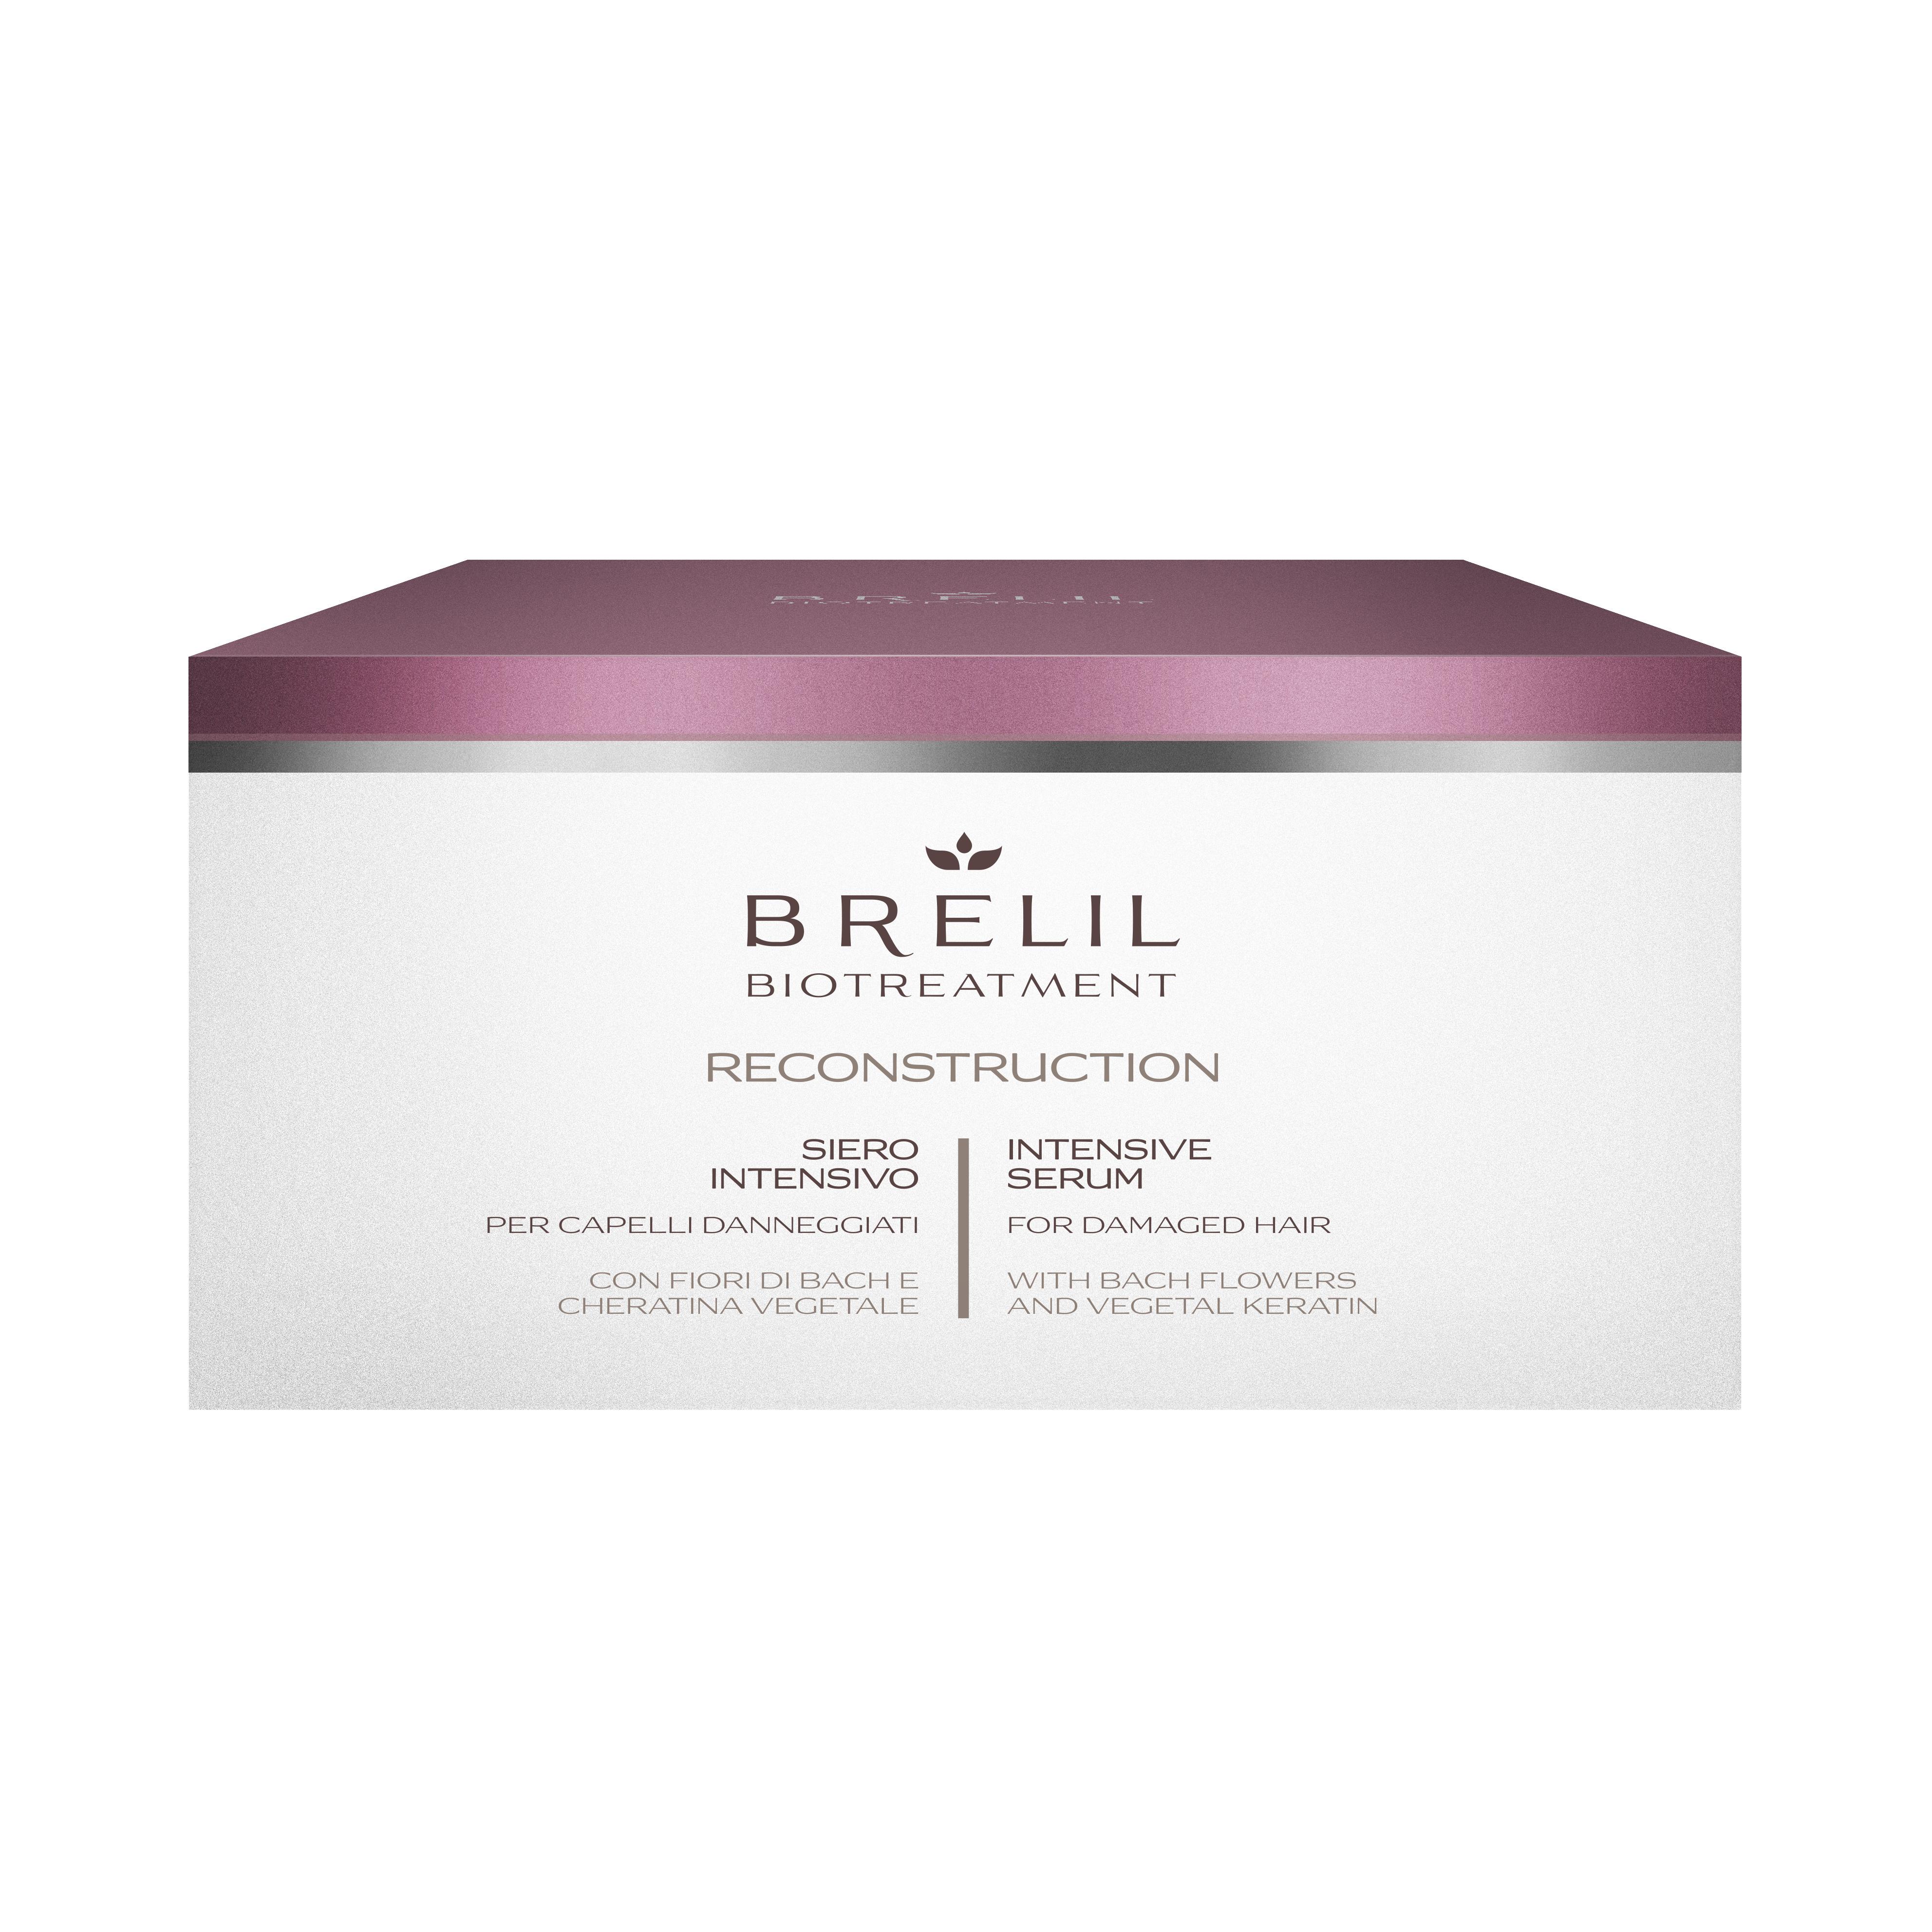 ИНТЕНЗИВЕН РЕСТРУКТУРИРАЩ СЕРУМ Brelil Biotreatment Reconstruction Serum 10x15 ml